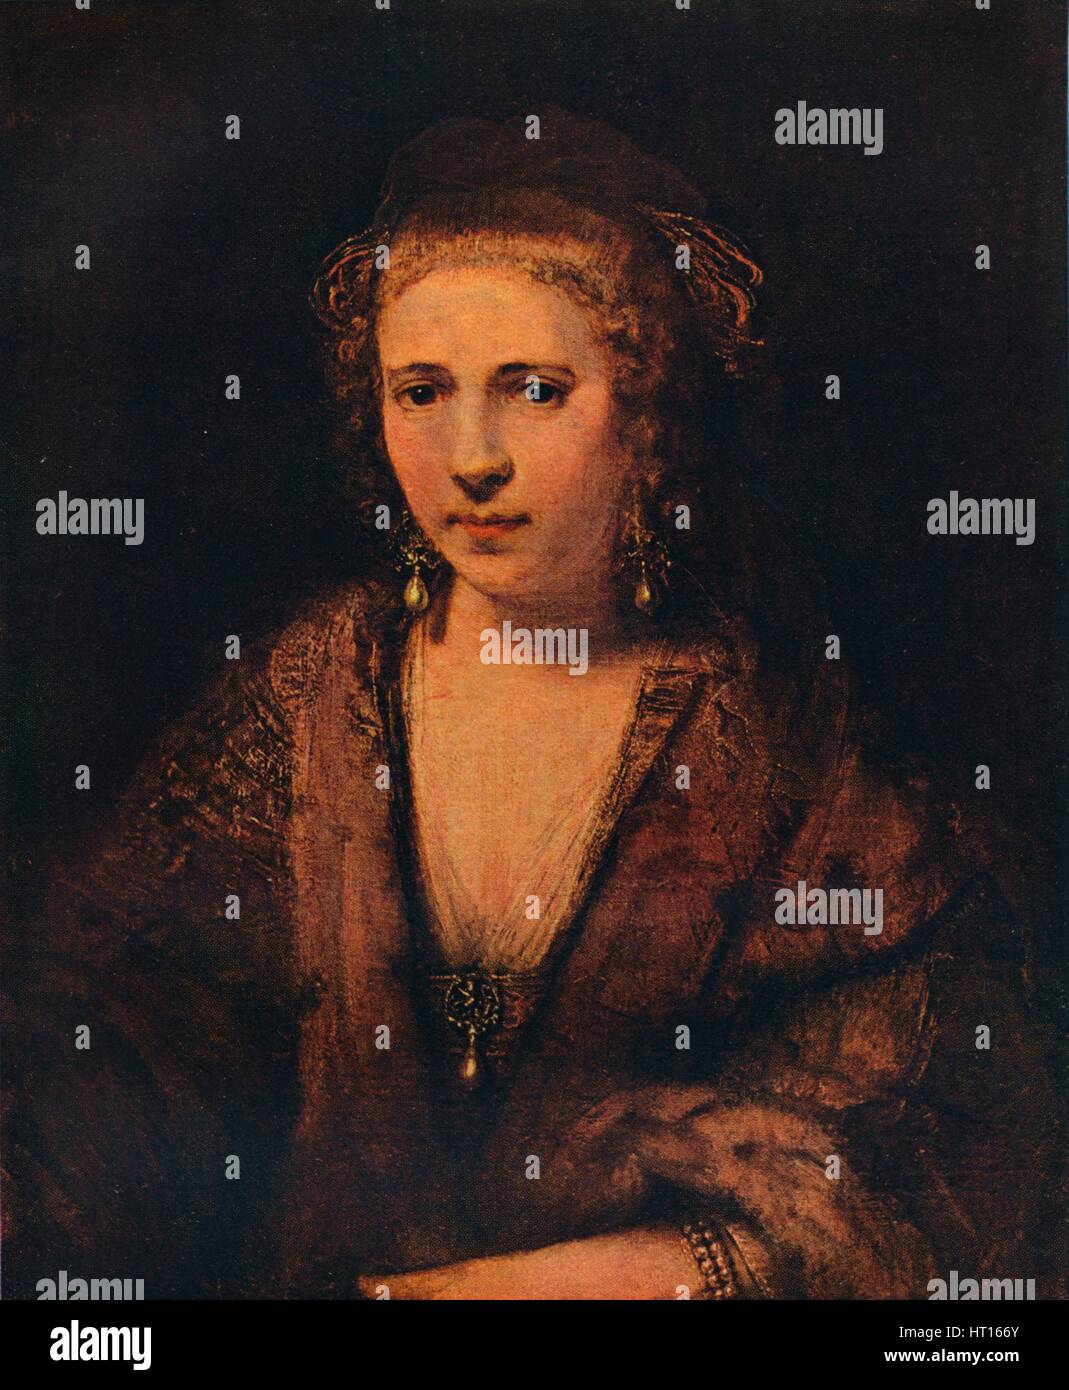 'Portrait of Hendrickje Stoffels with a Velvet Beret ', c1654. Artist: Rembrandt Harmensz van Rijn. - Stock Image